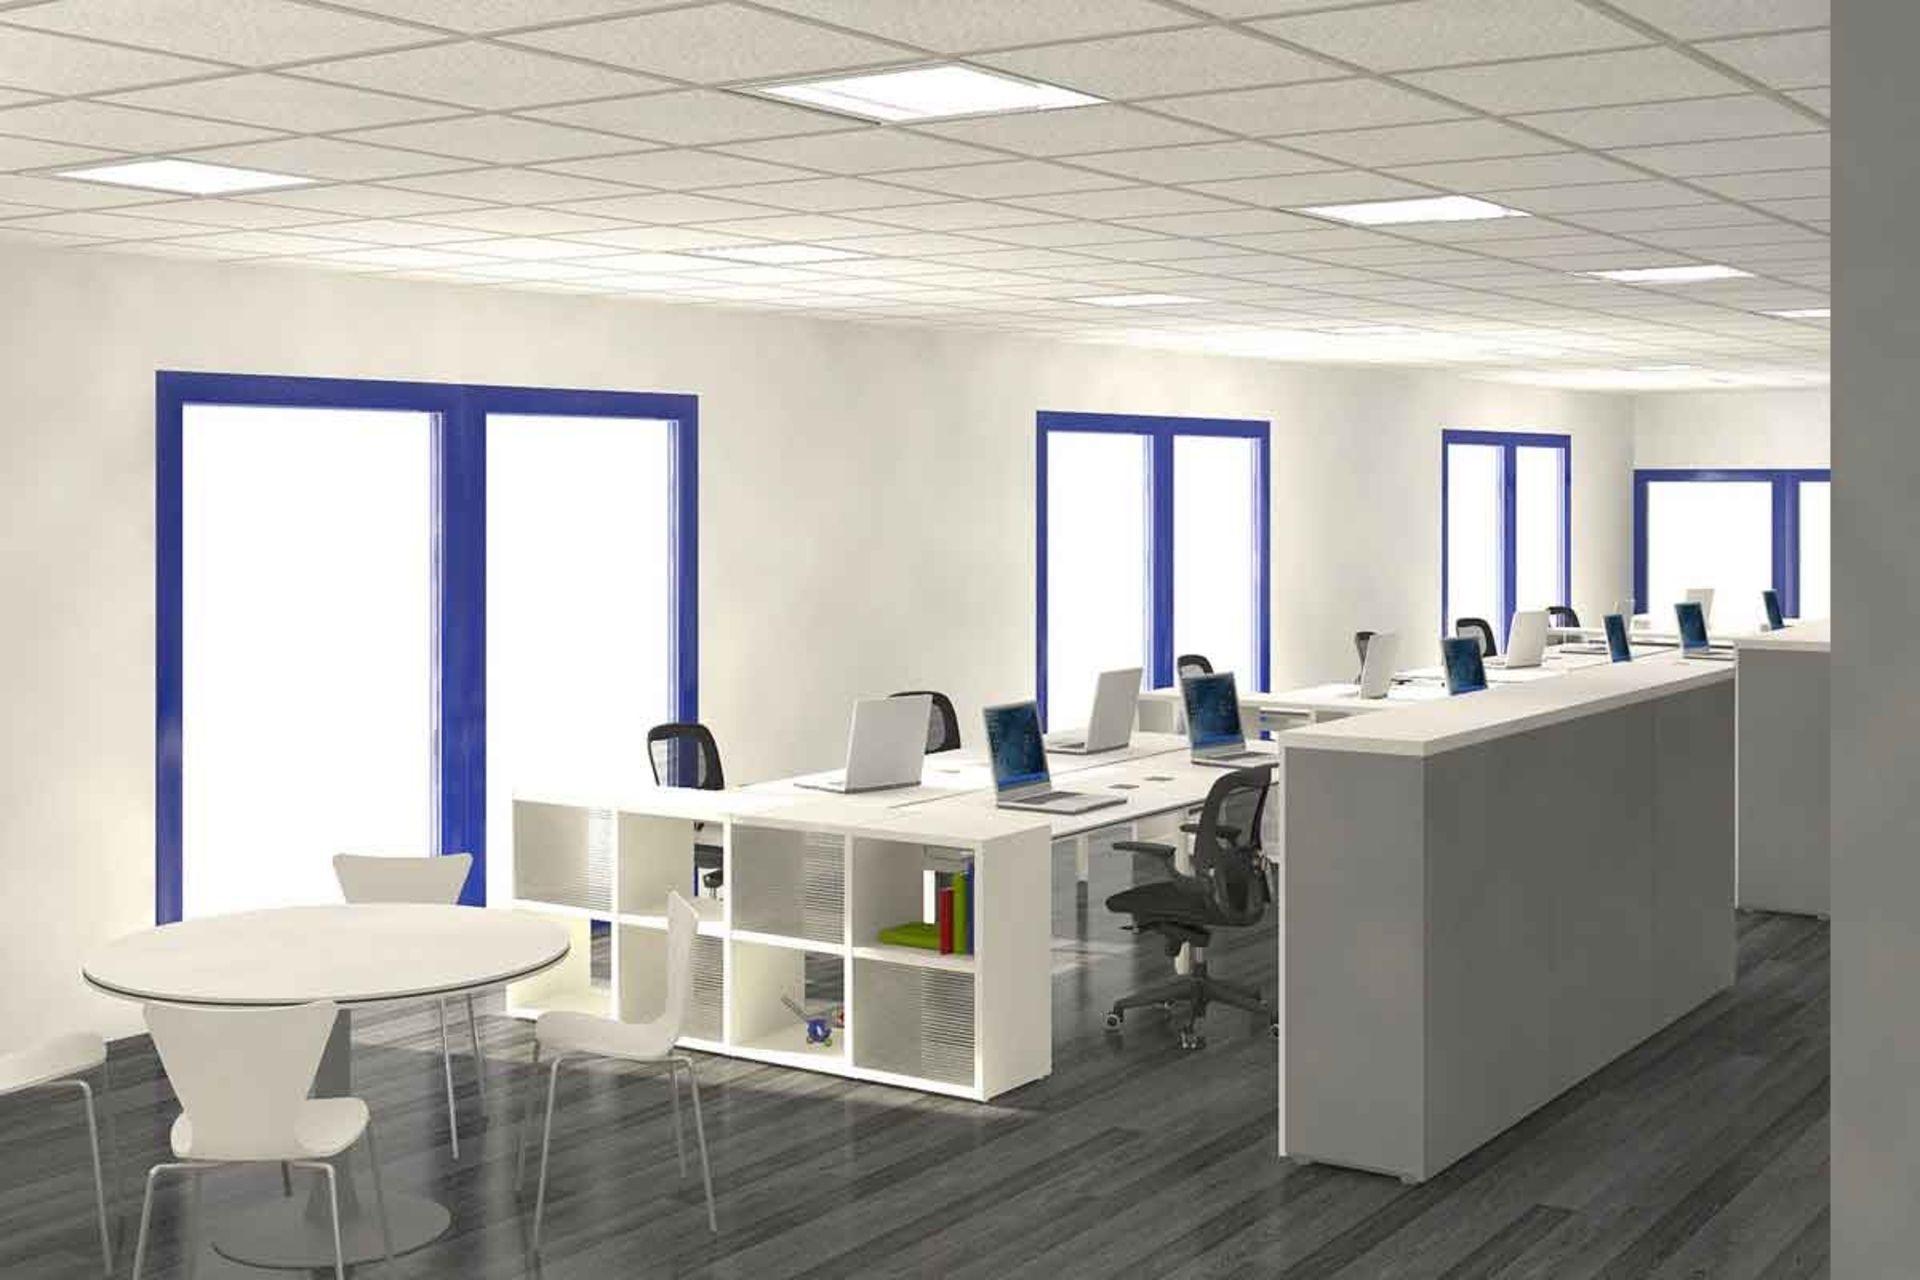 ikea office decor. Corporate Office Decor Using Ikea Furniture - Google Search F